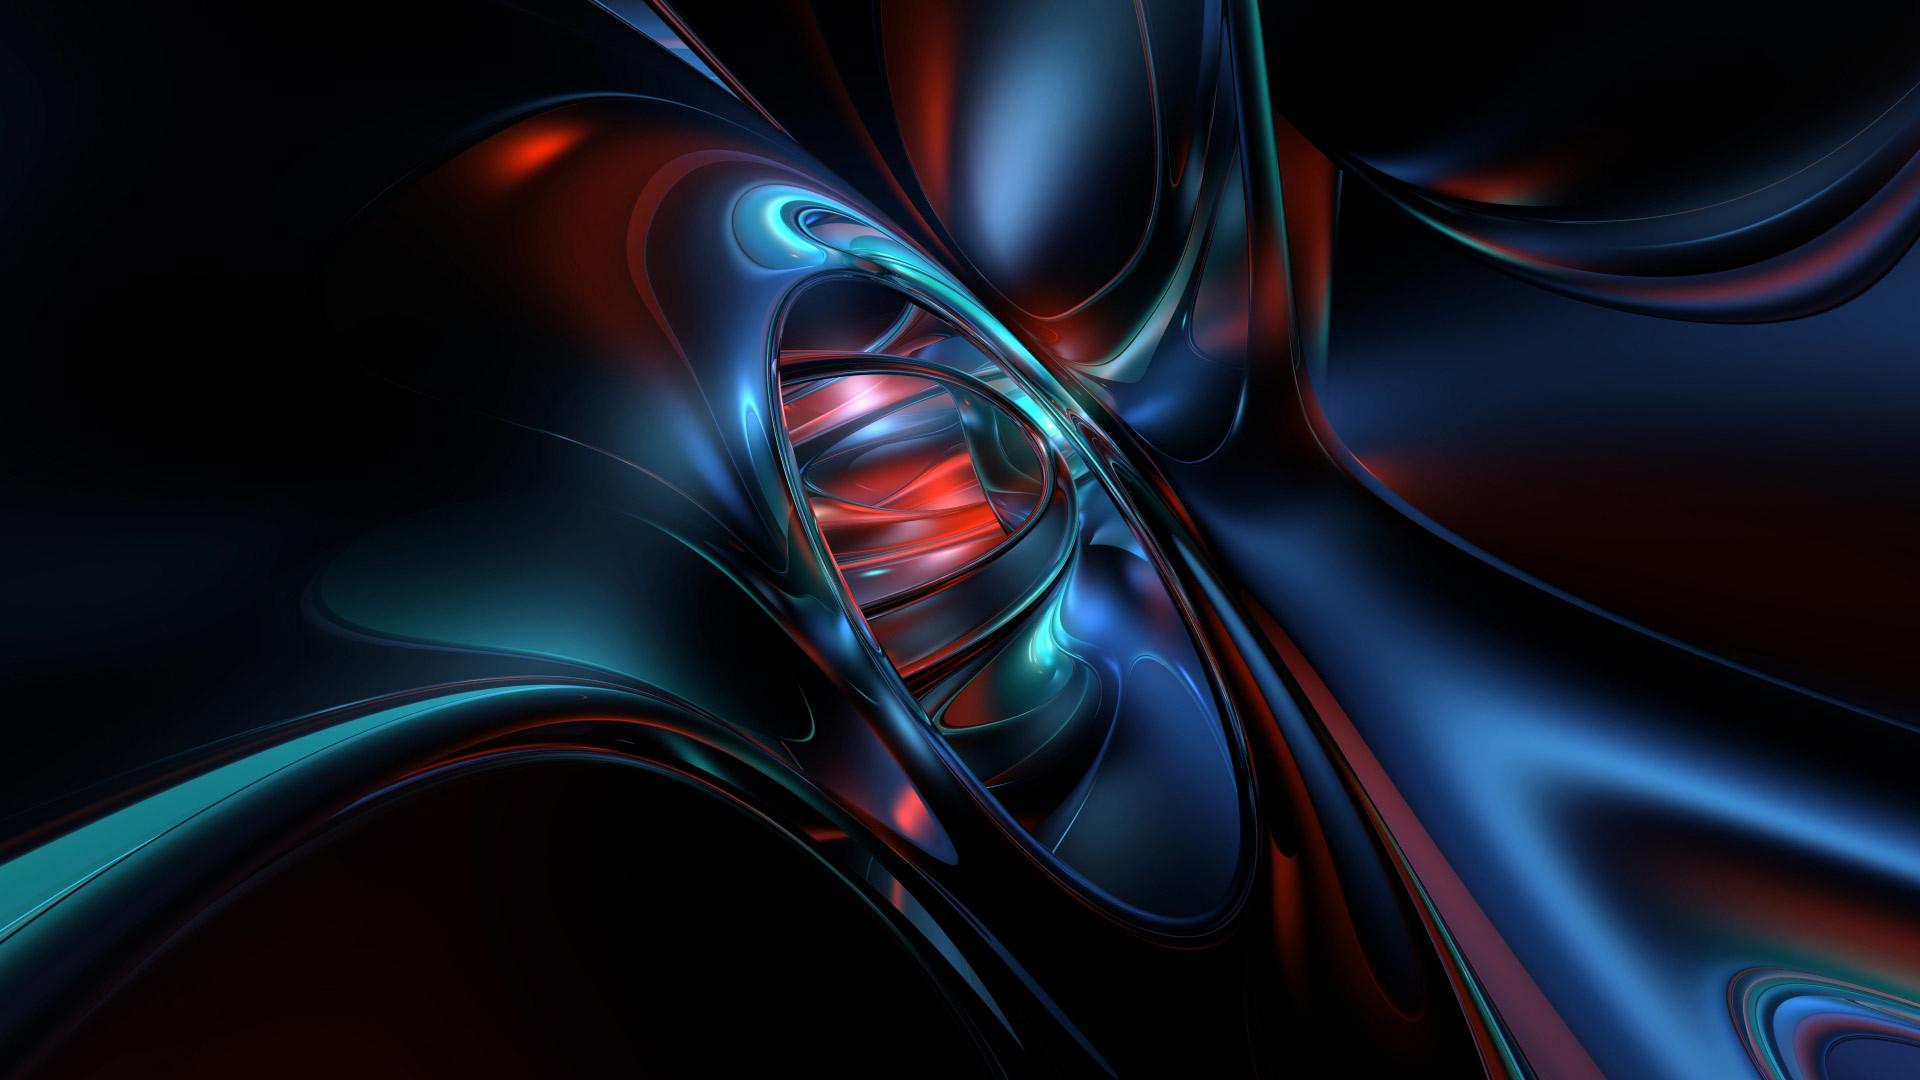 Dark 3D Abstract